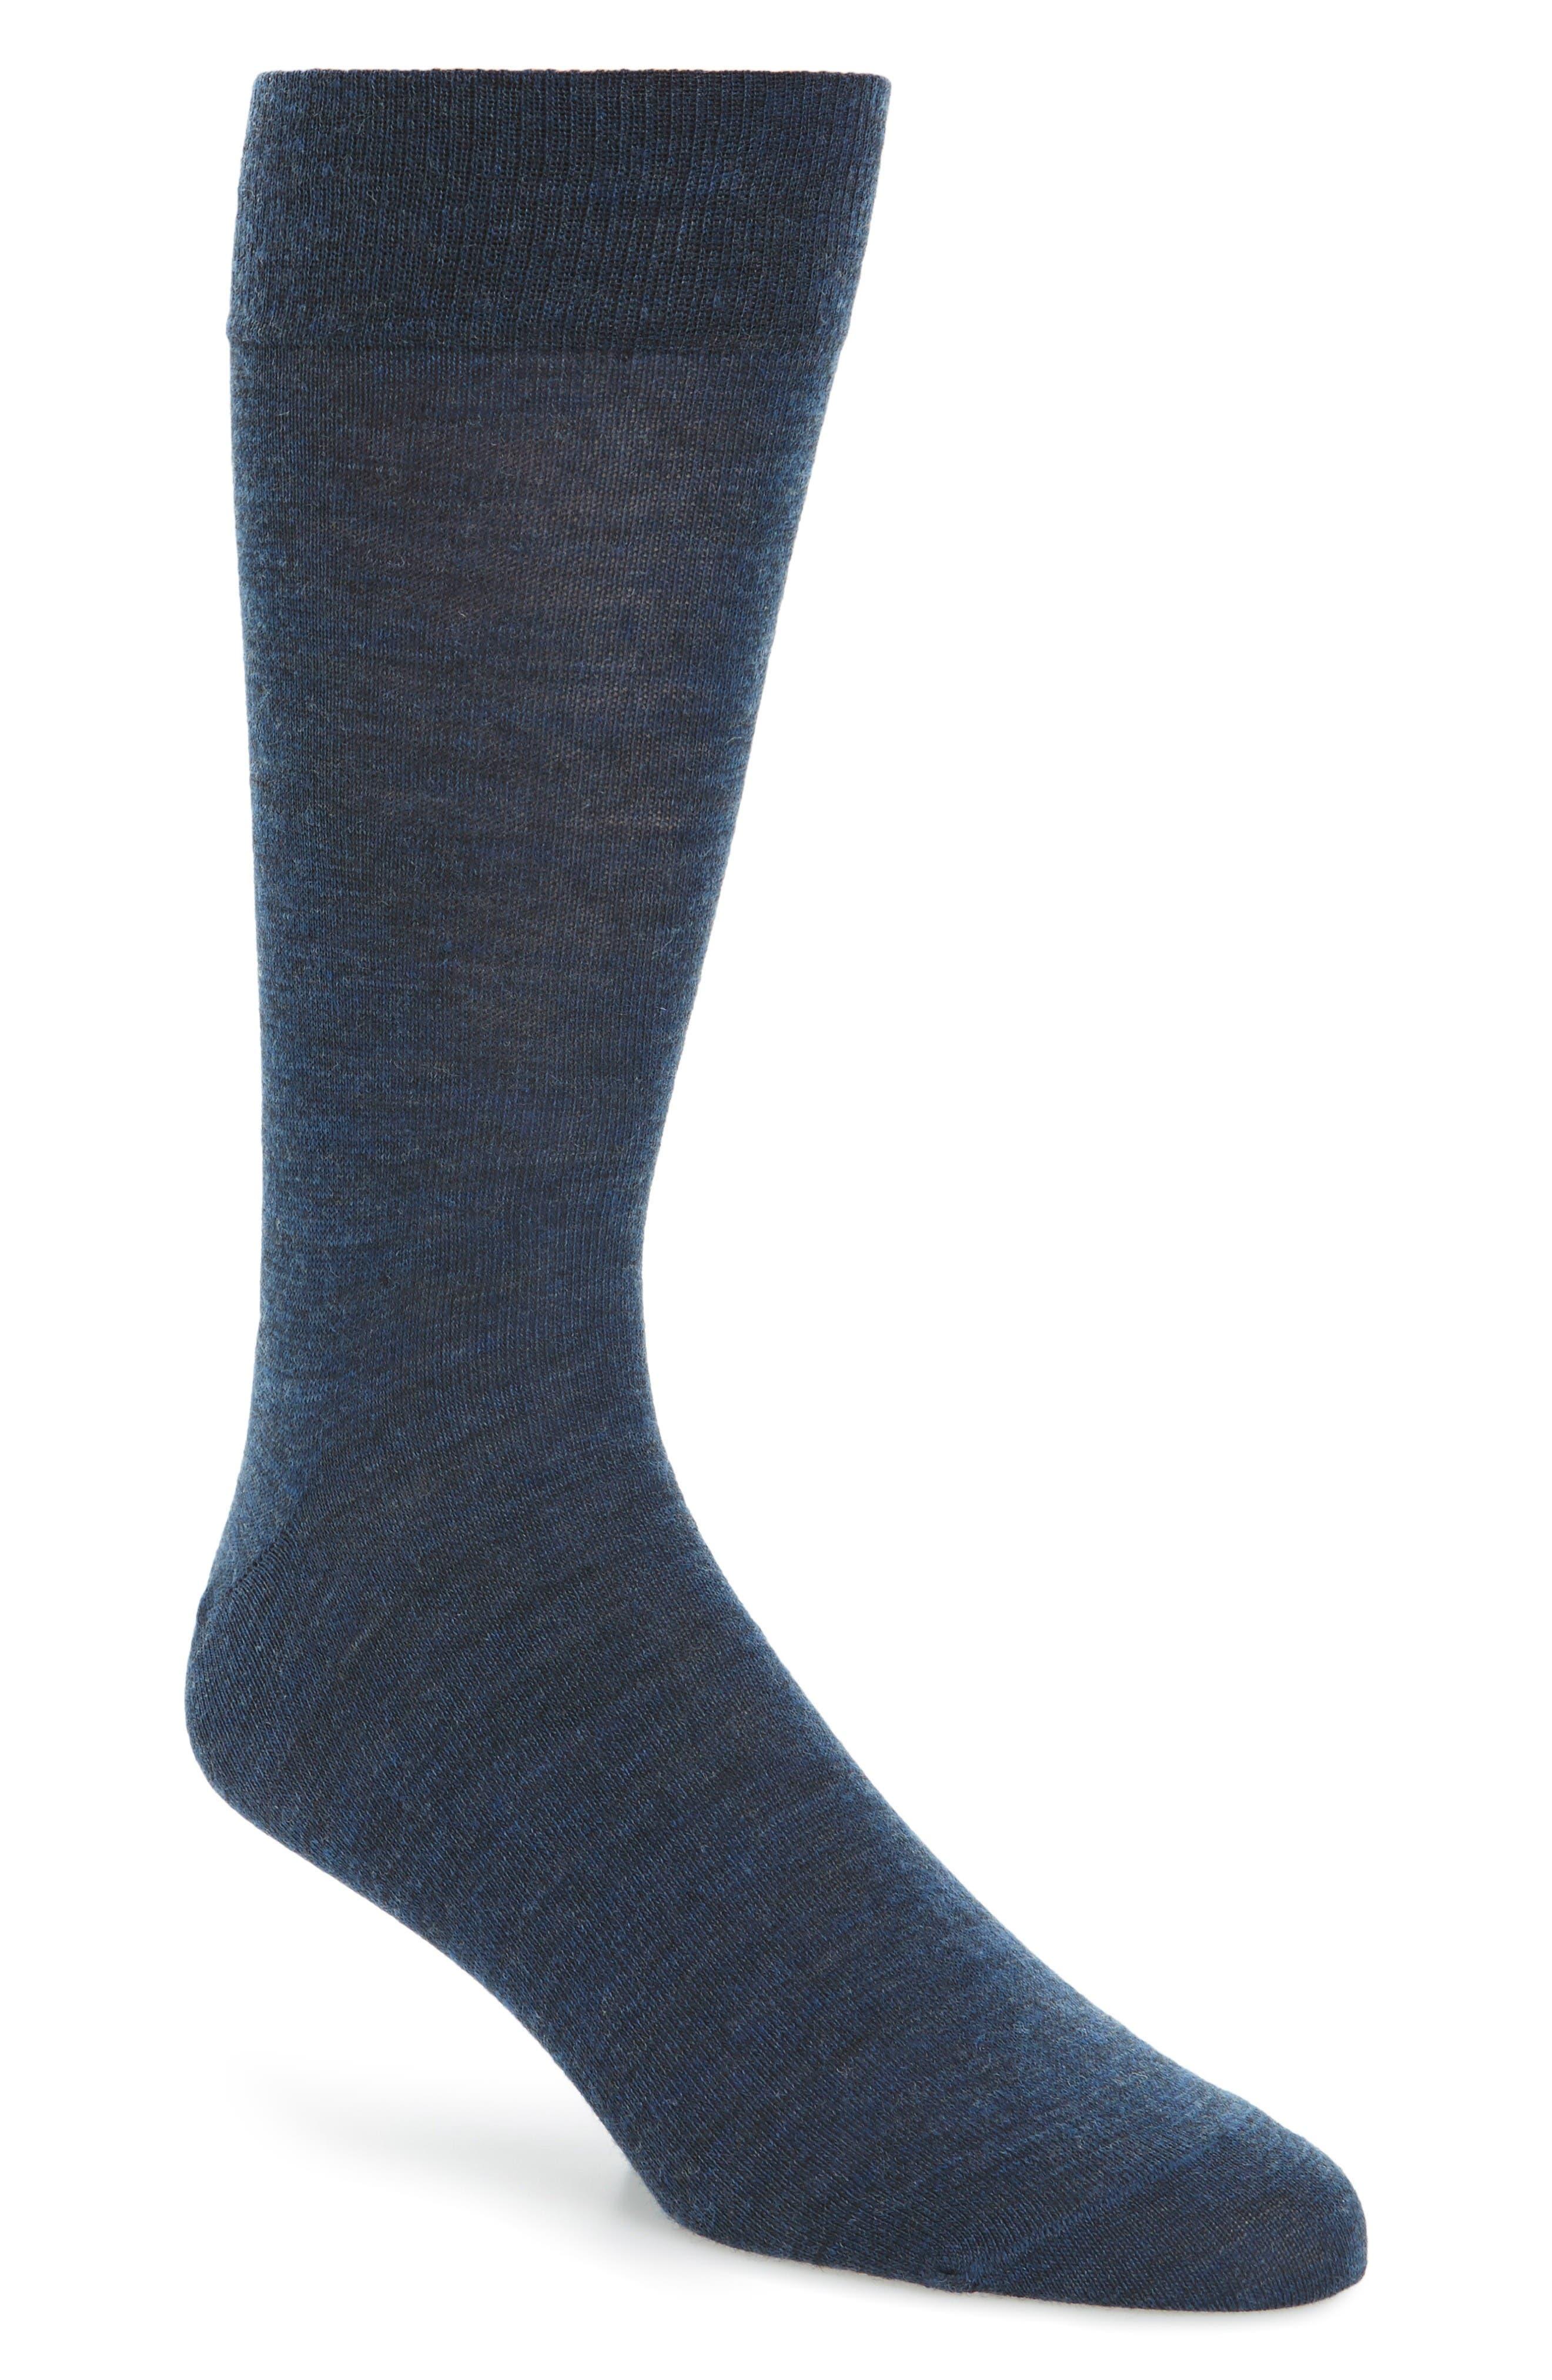 Lorenzo Uomo Merino Wool Blend Socks (3 for $30)